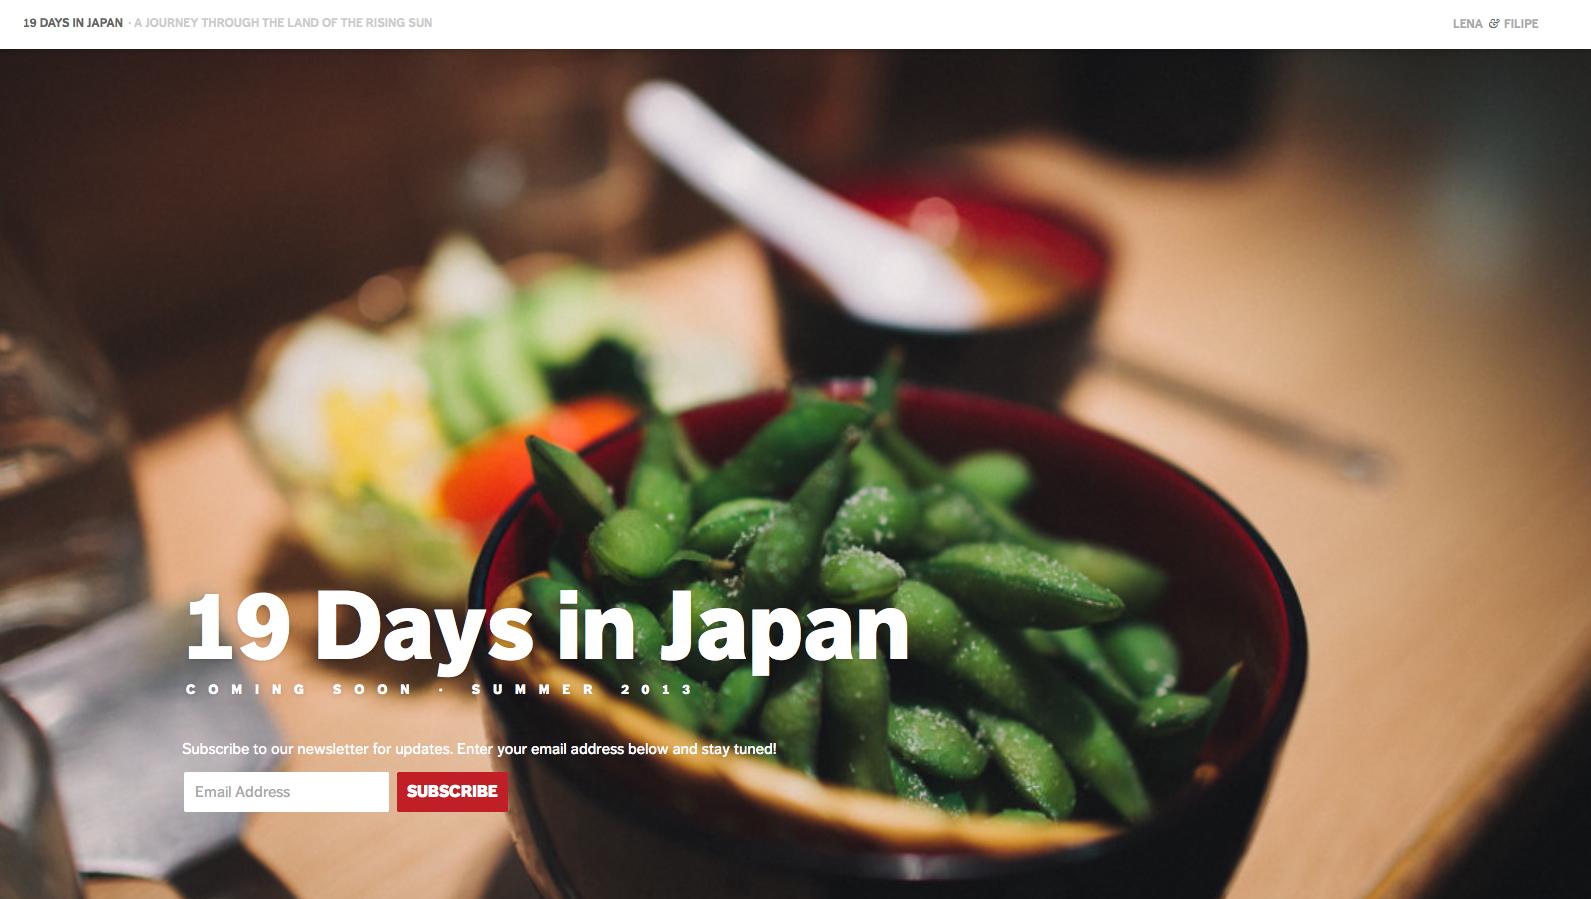 19daysinjapan.com